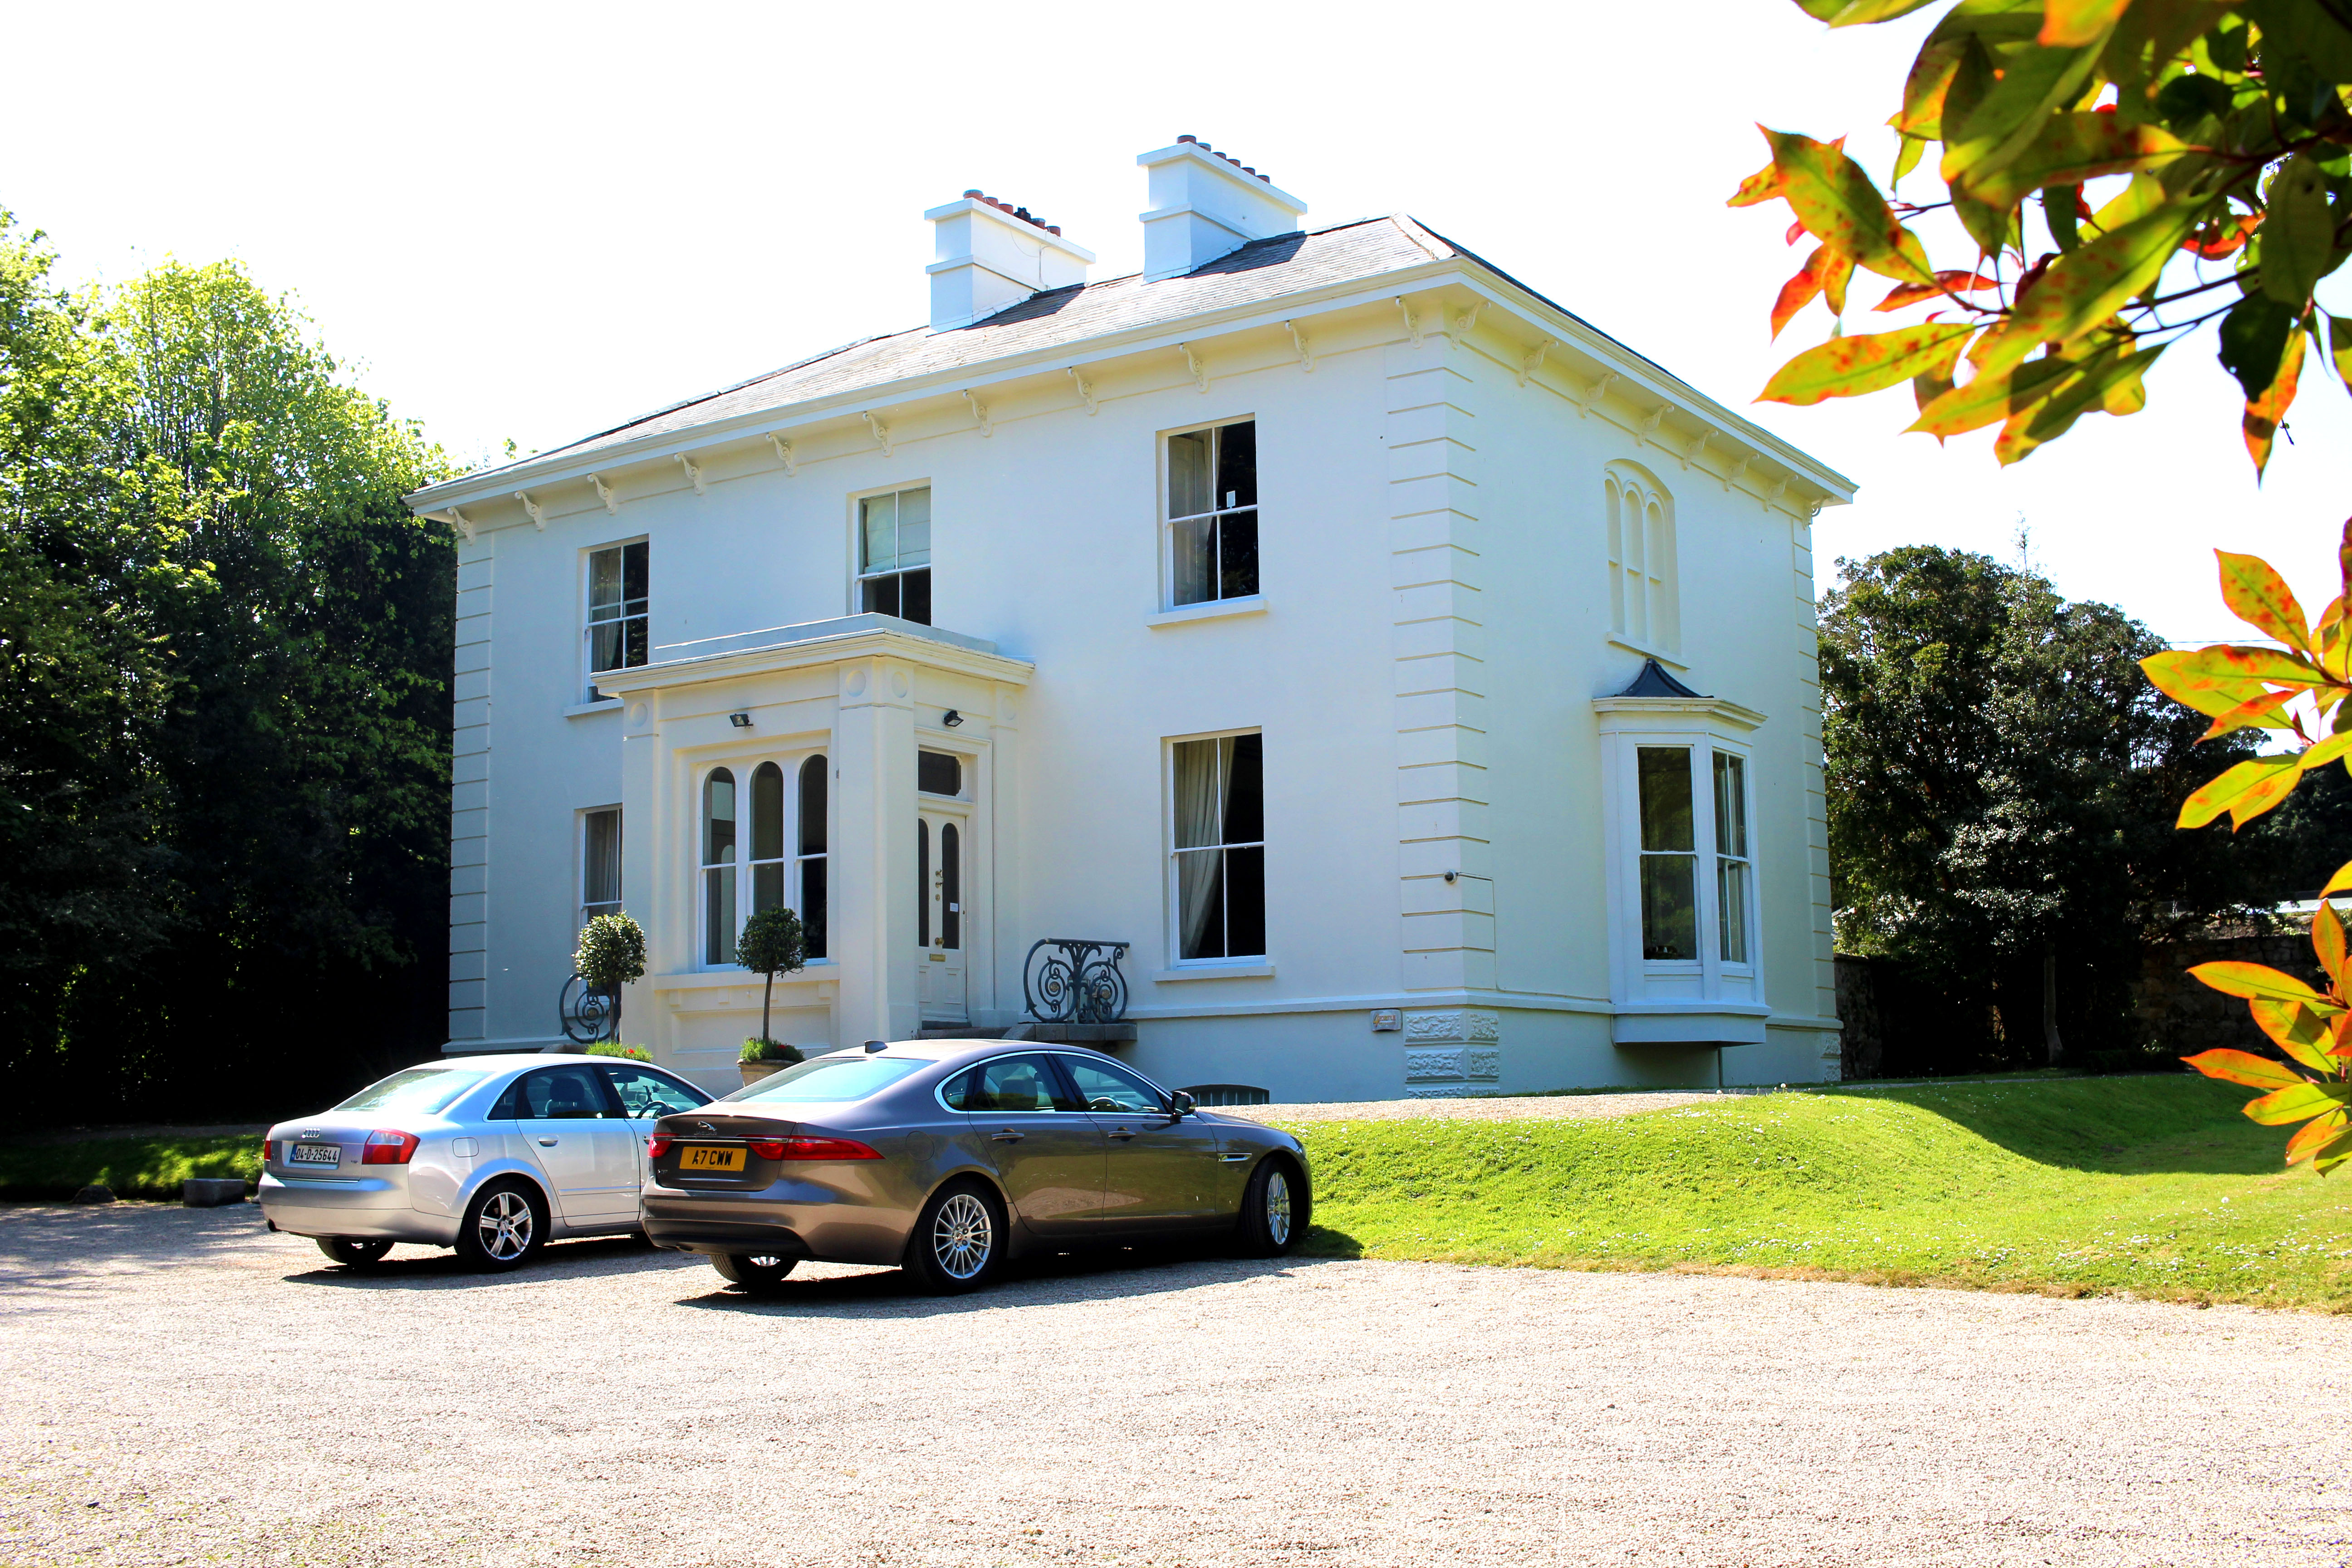 ROSEDALE HOUSE - Lodge Reviews (Shankill, Ireland) - Tripadvisor